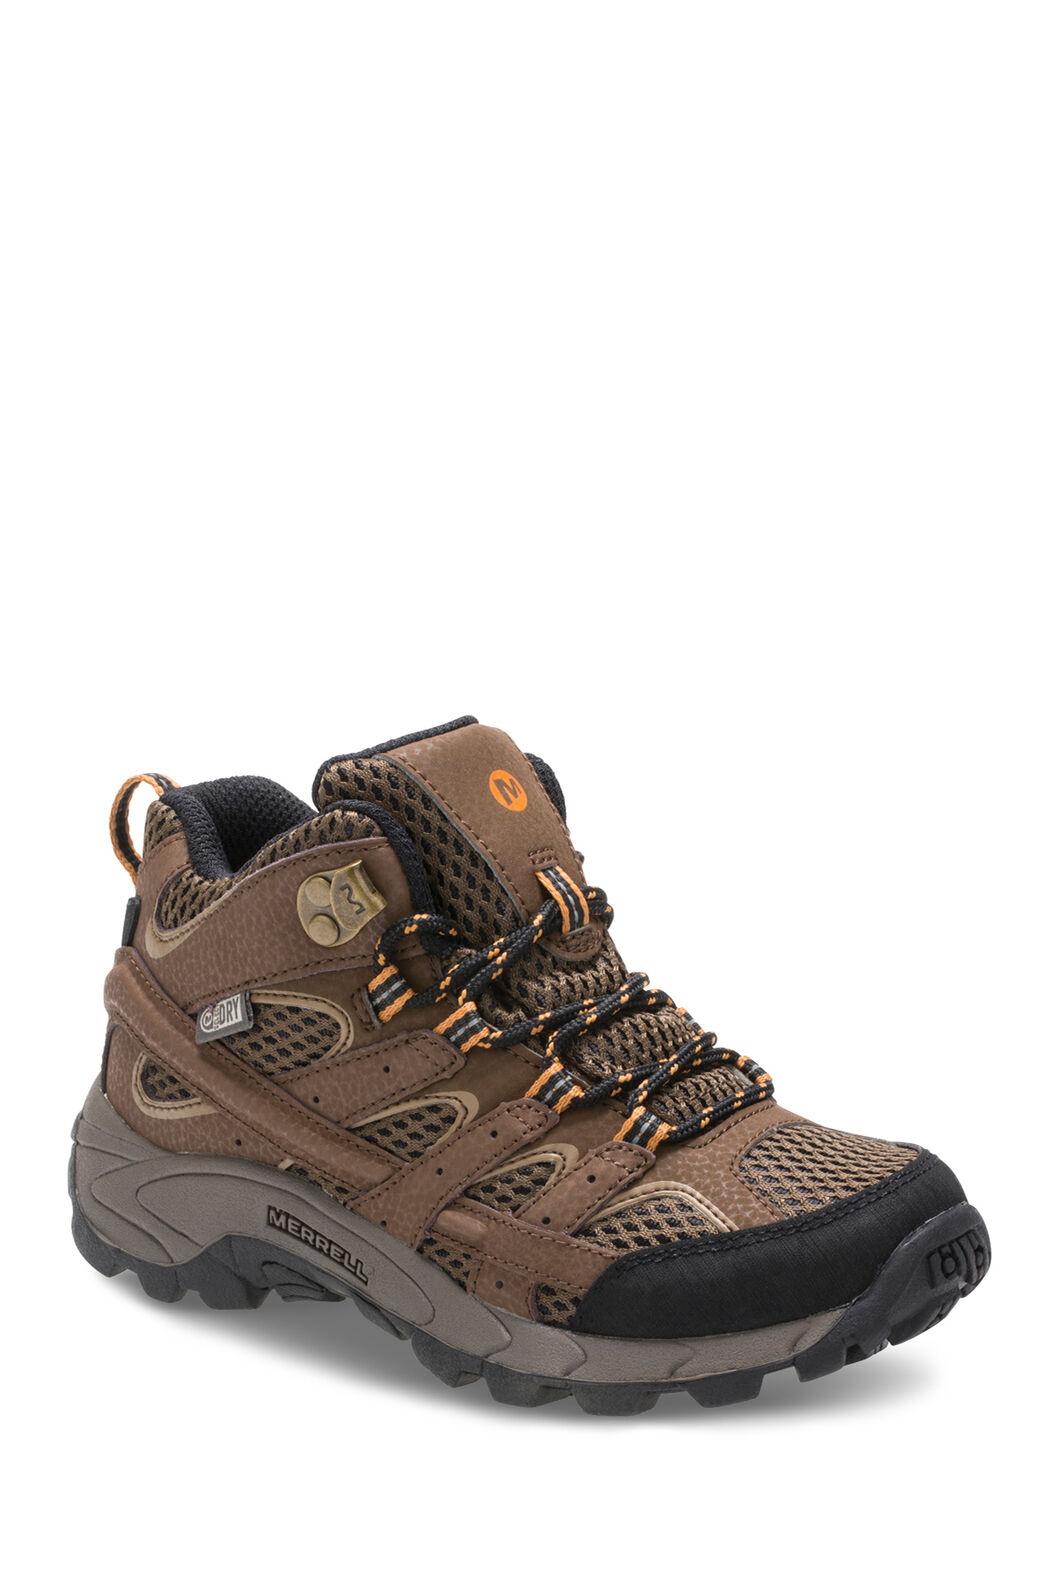 Merrell Moab 2 Waterproof Hiking Boots — Kids', Earth, hi-res